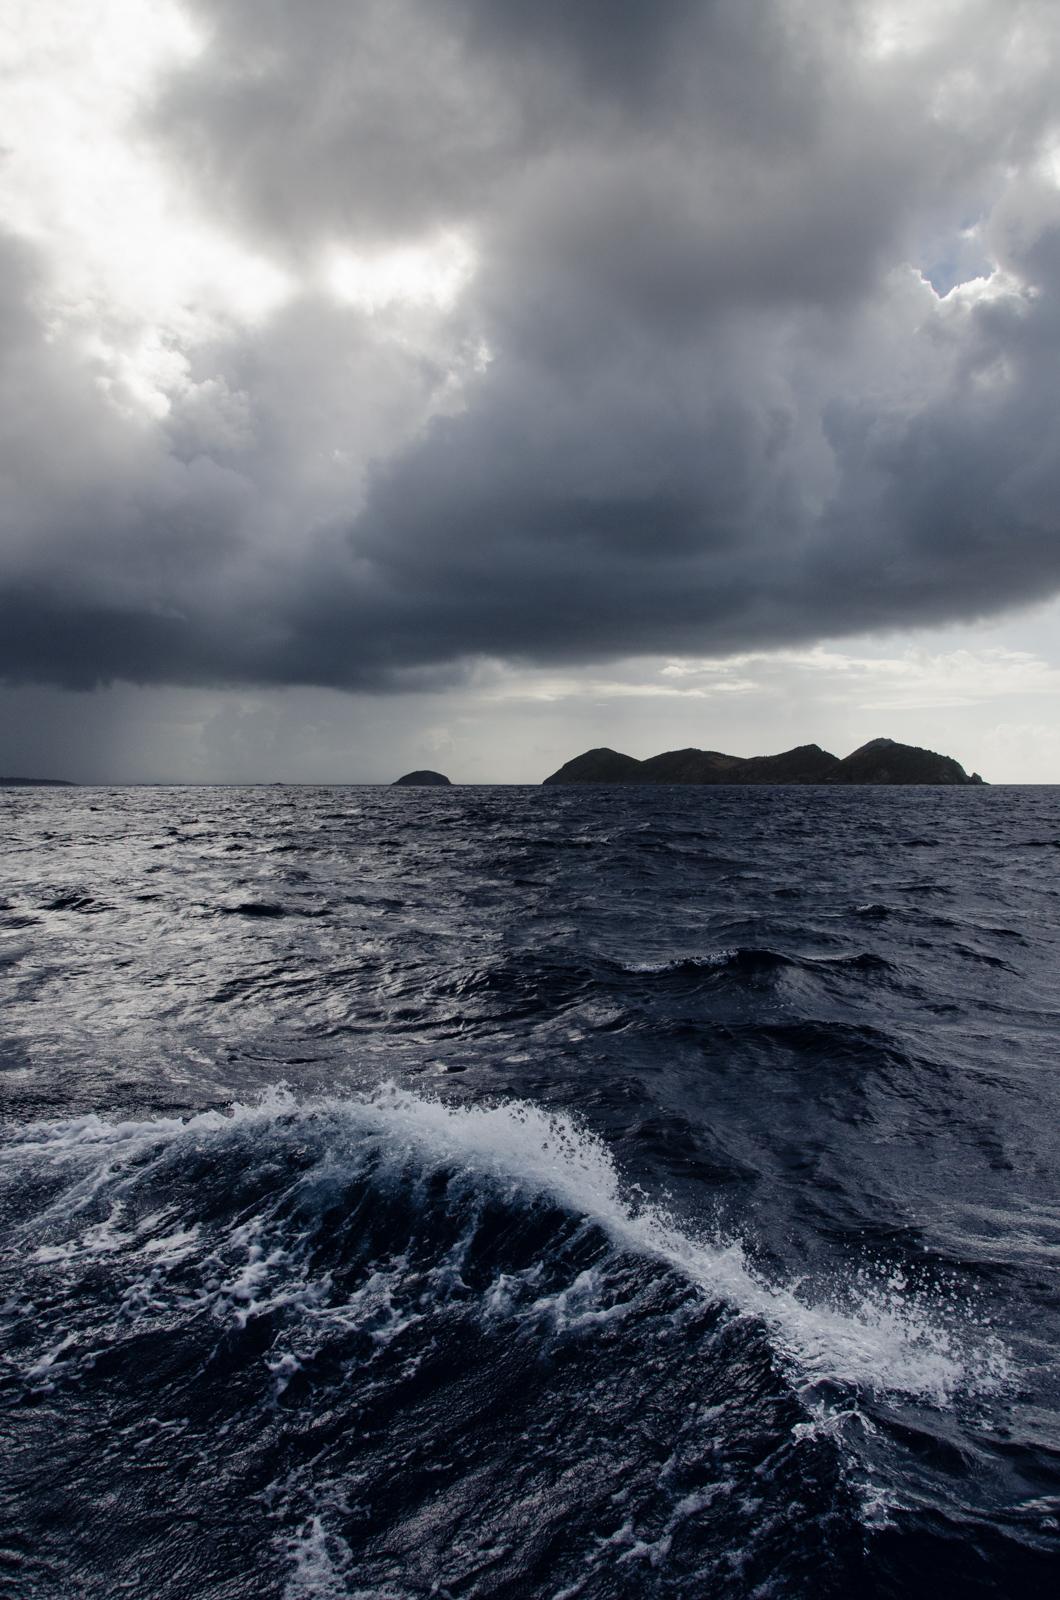 Captain Bob slid us into Virgin Gorda just behind this storm. We didn't feel a drop.